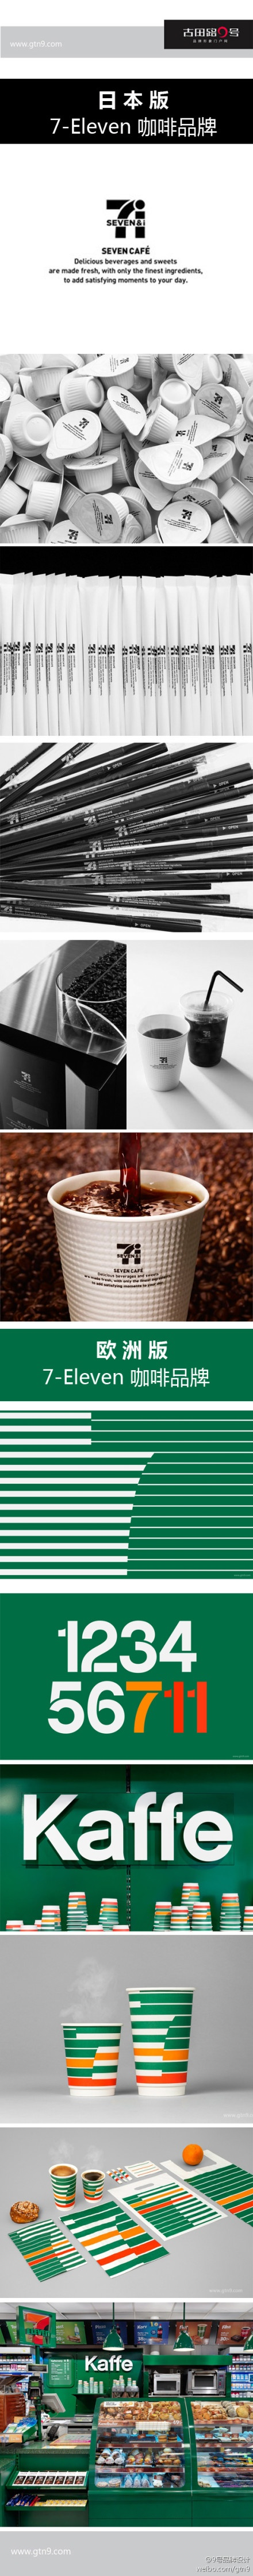 7-Eleven 咖啡品牌2种味道 ★ 日本版 VS 欧洲版 ★ 【 佐藤可士和:SEVEN ELEVEN的新品牌SEVEN咖啡馆诞生